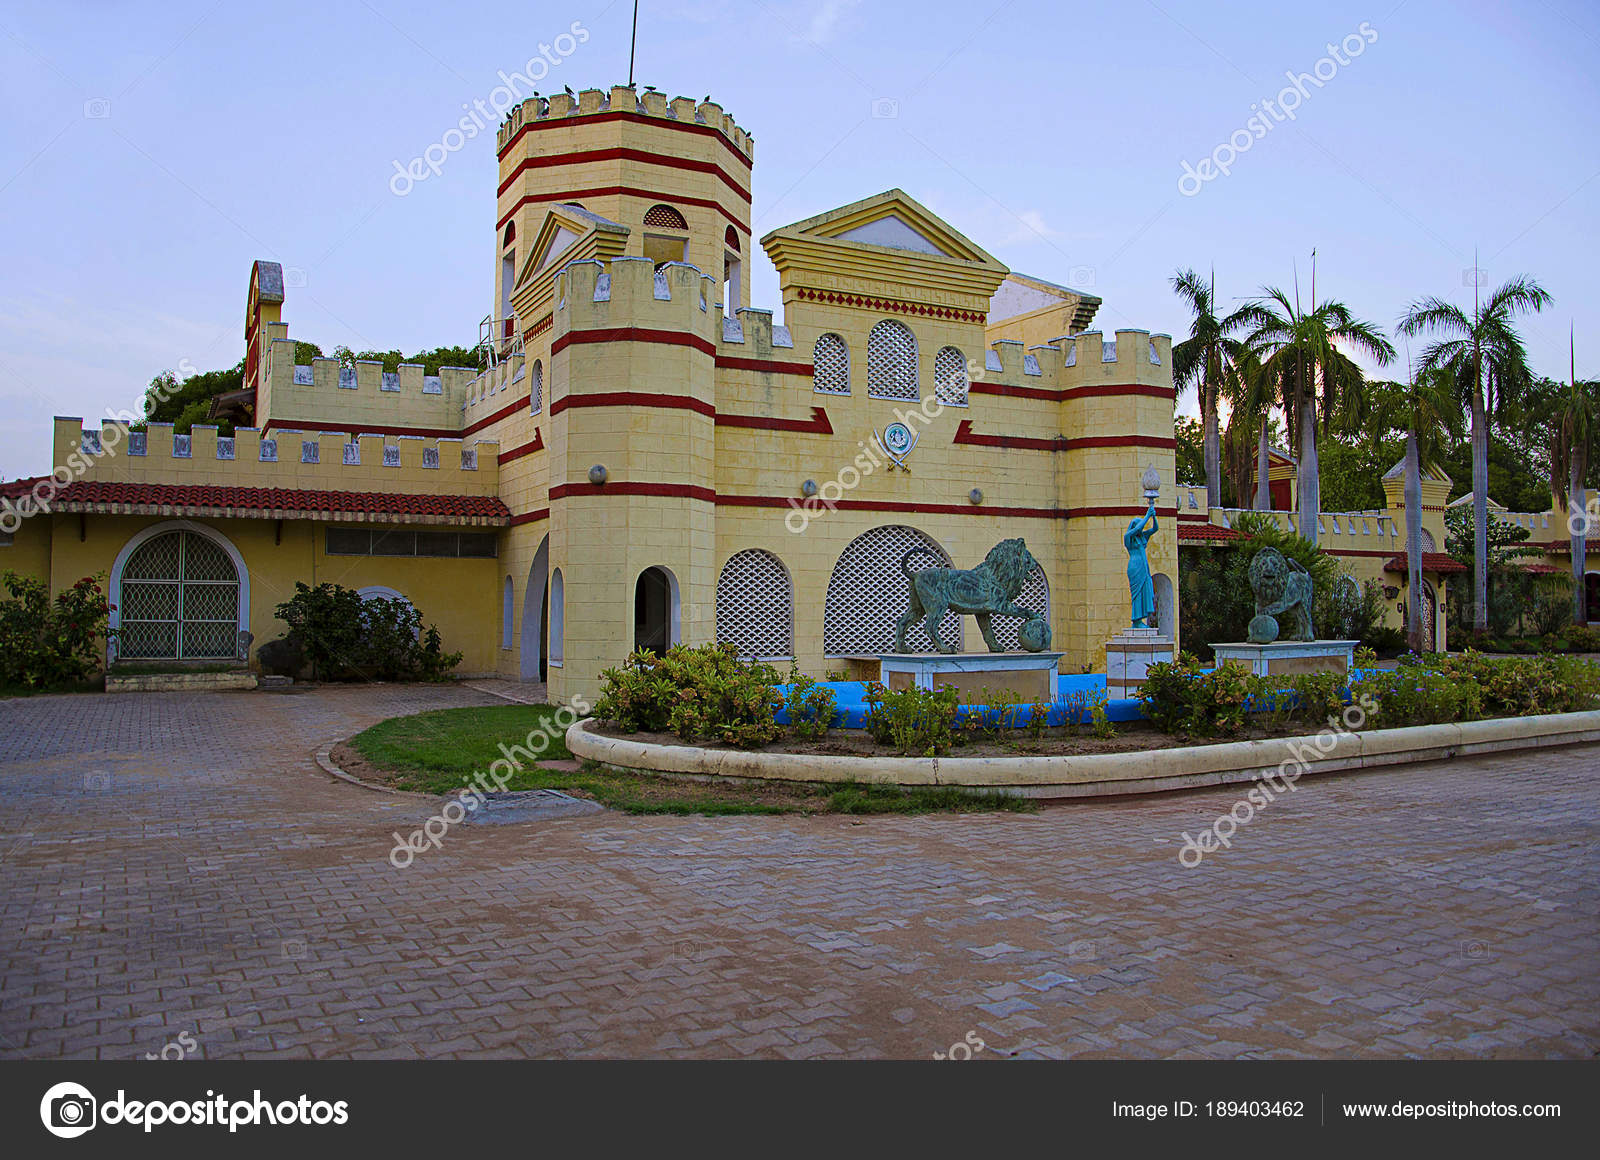 Auto world vintage car museum, Ahmedabad, Gujarat — Stock Photo ...